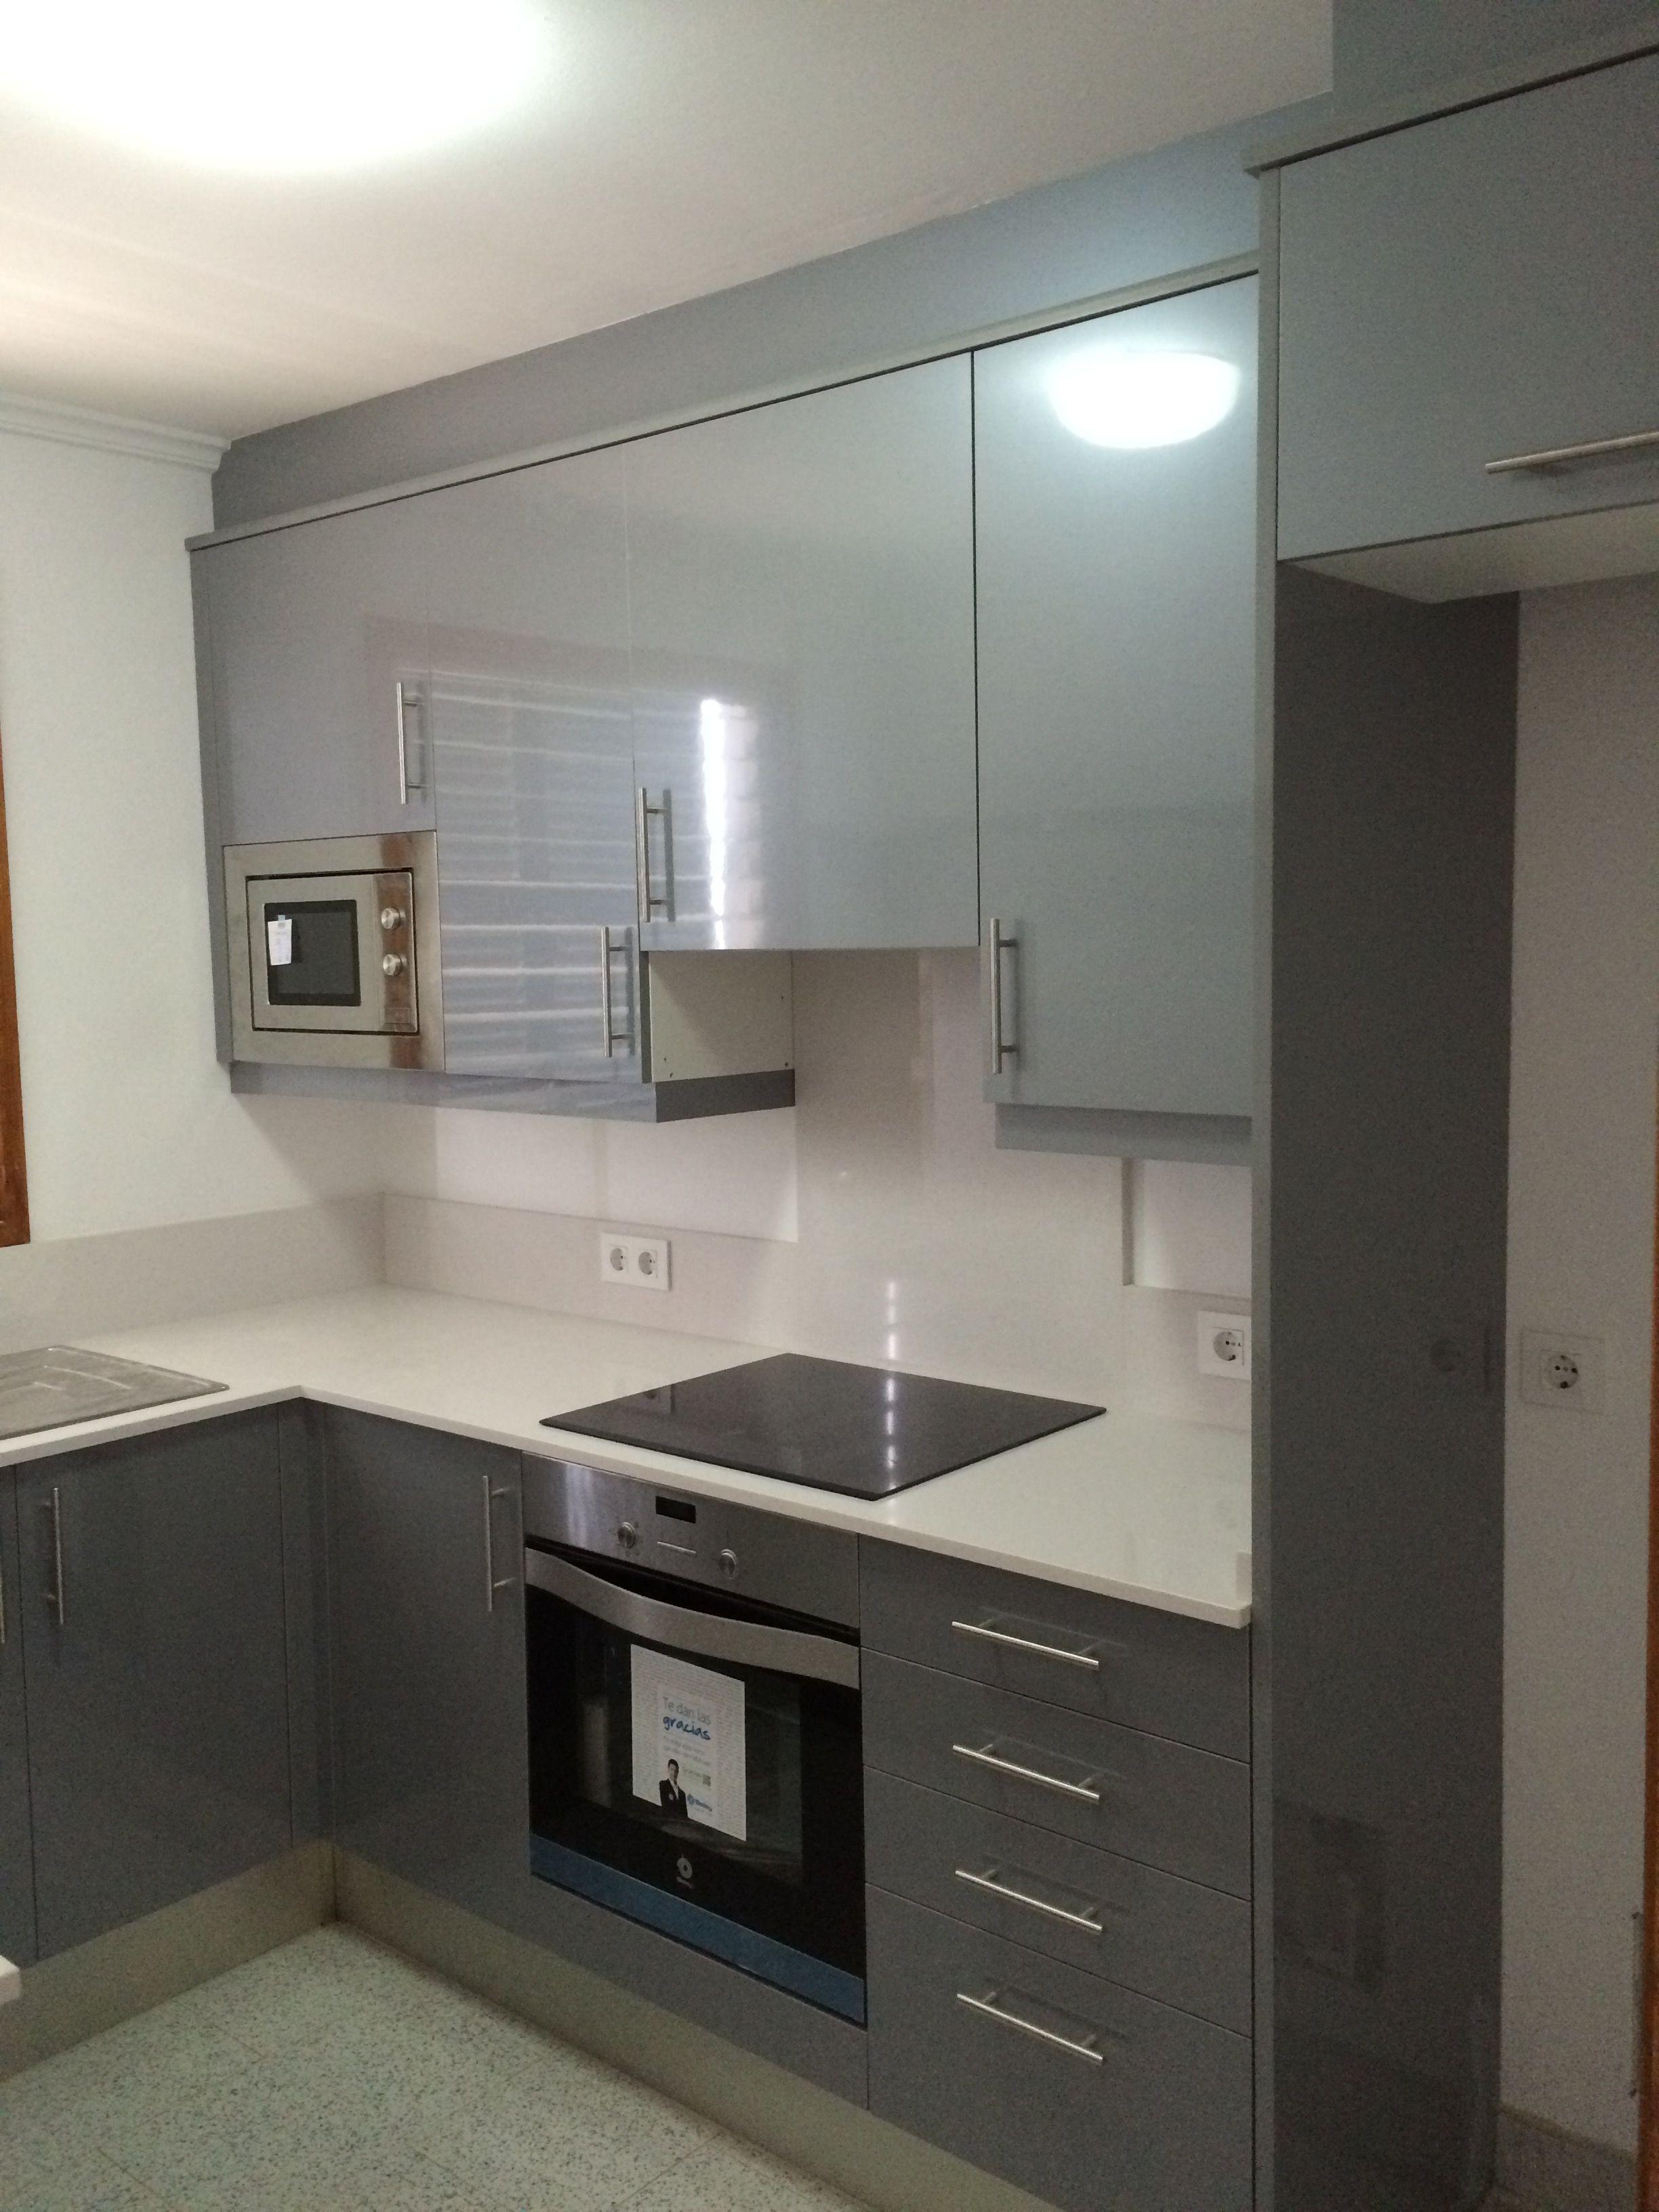 Cocina de peque as dimensiones en gris con silestone for Cocinas modernas barcelona